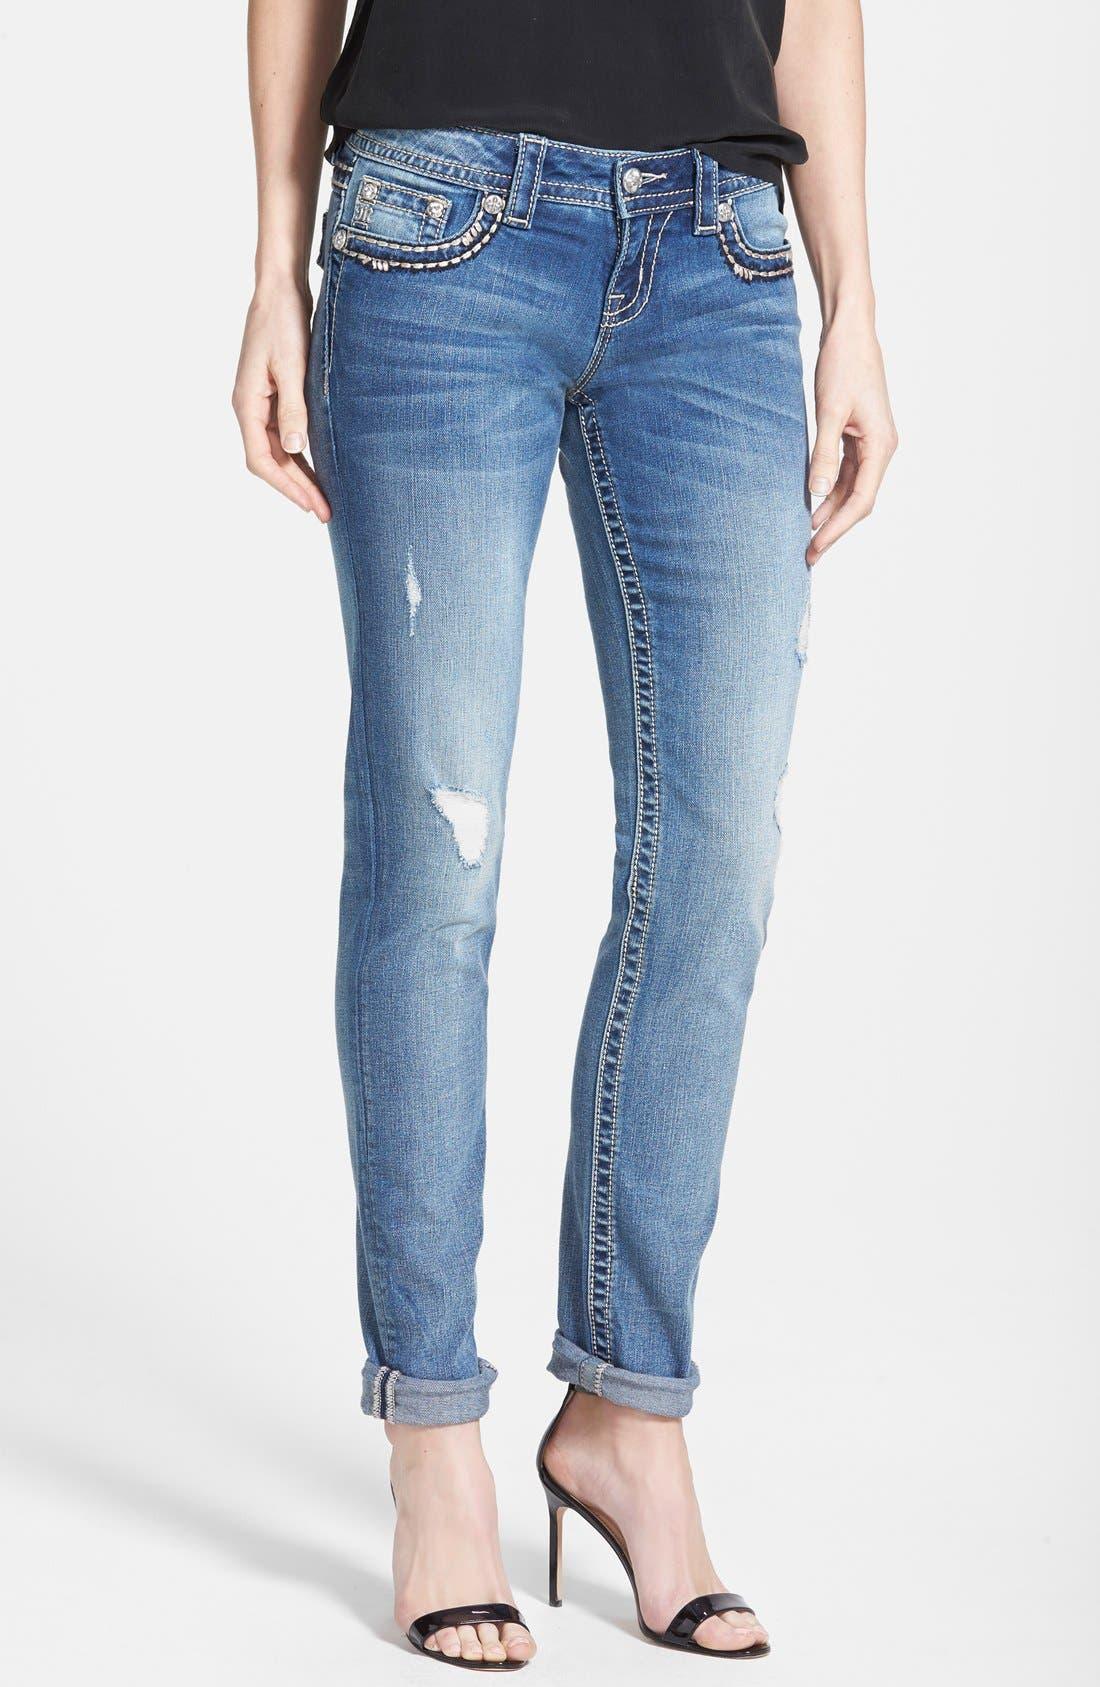 Alternate Image 1 Selected - Miss Me Flap Pocket Distressed Skinny Boyfriend Jeans (Medium Blue)